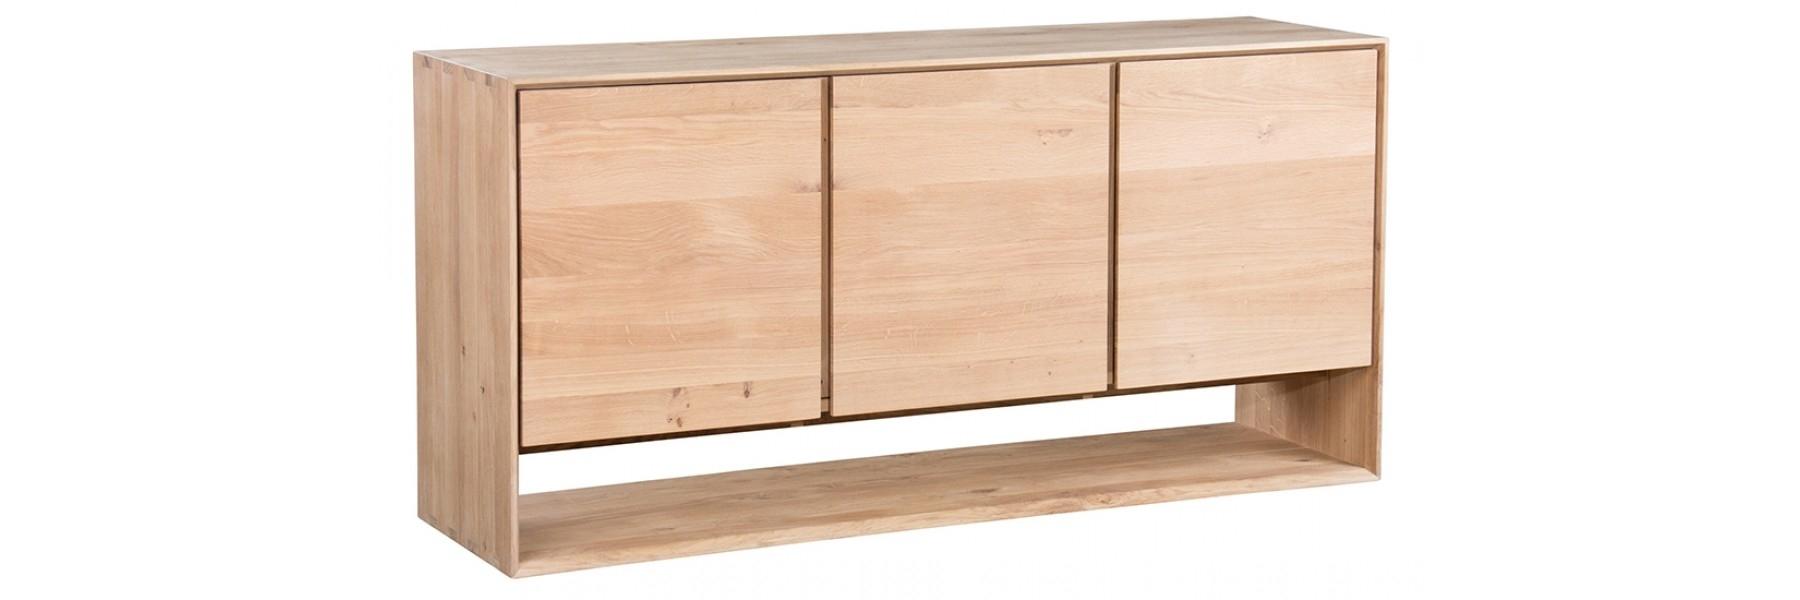 Oak Nordic Sideboard 3 Door in Dark Smoked Oak With White Marble Top Sideboards (Image 15 of 30)